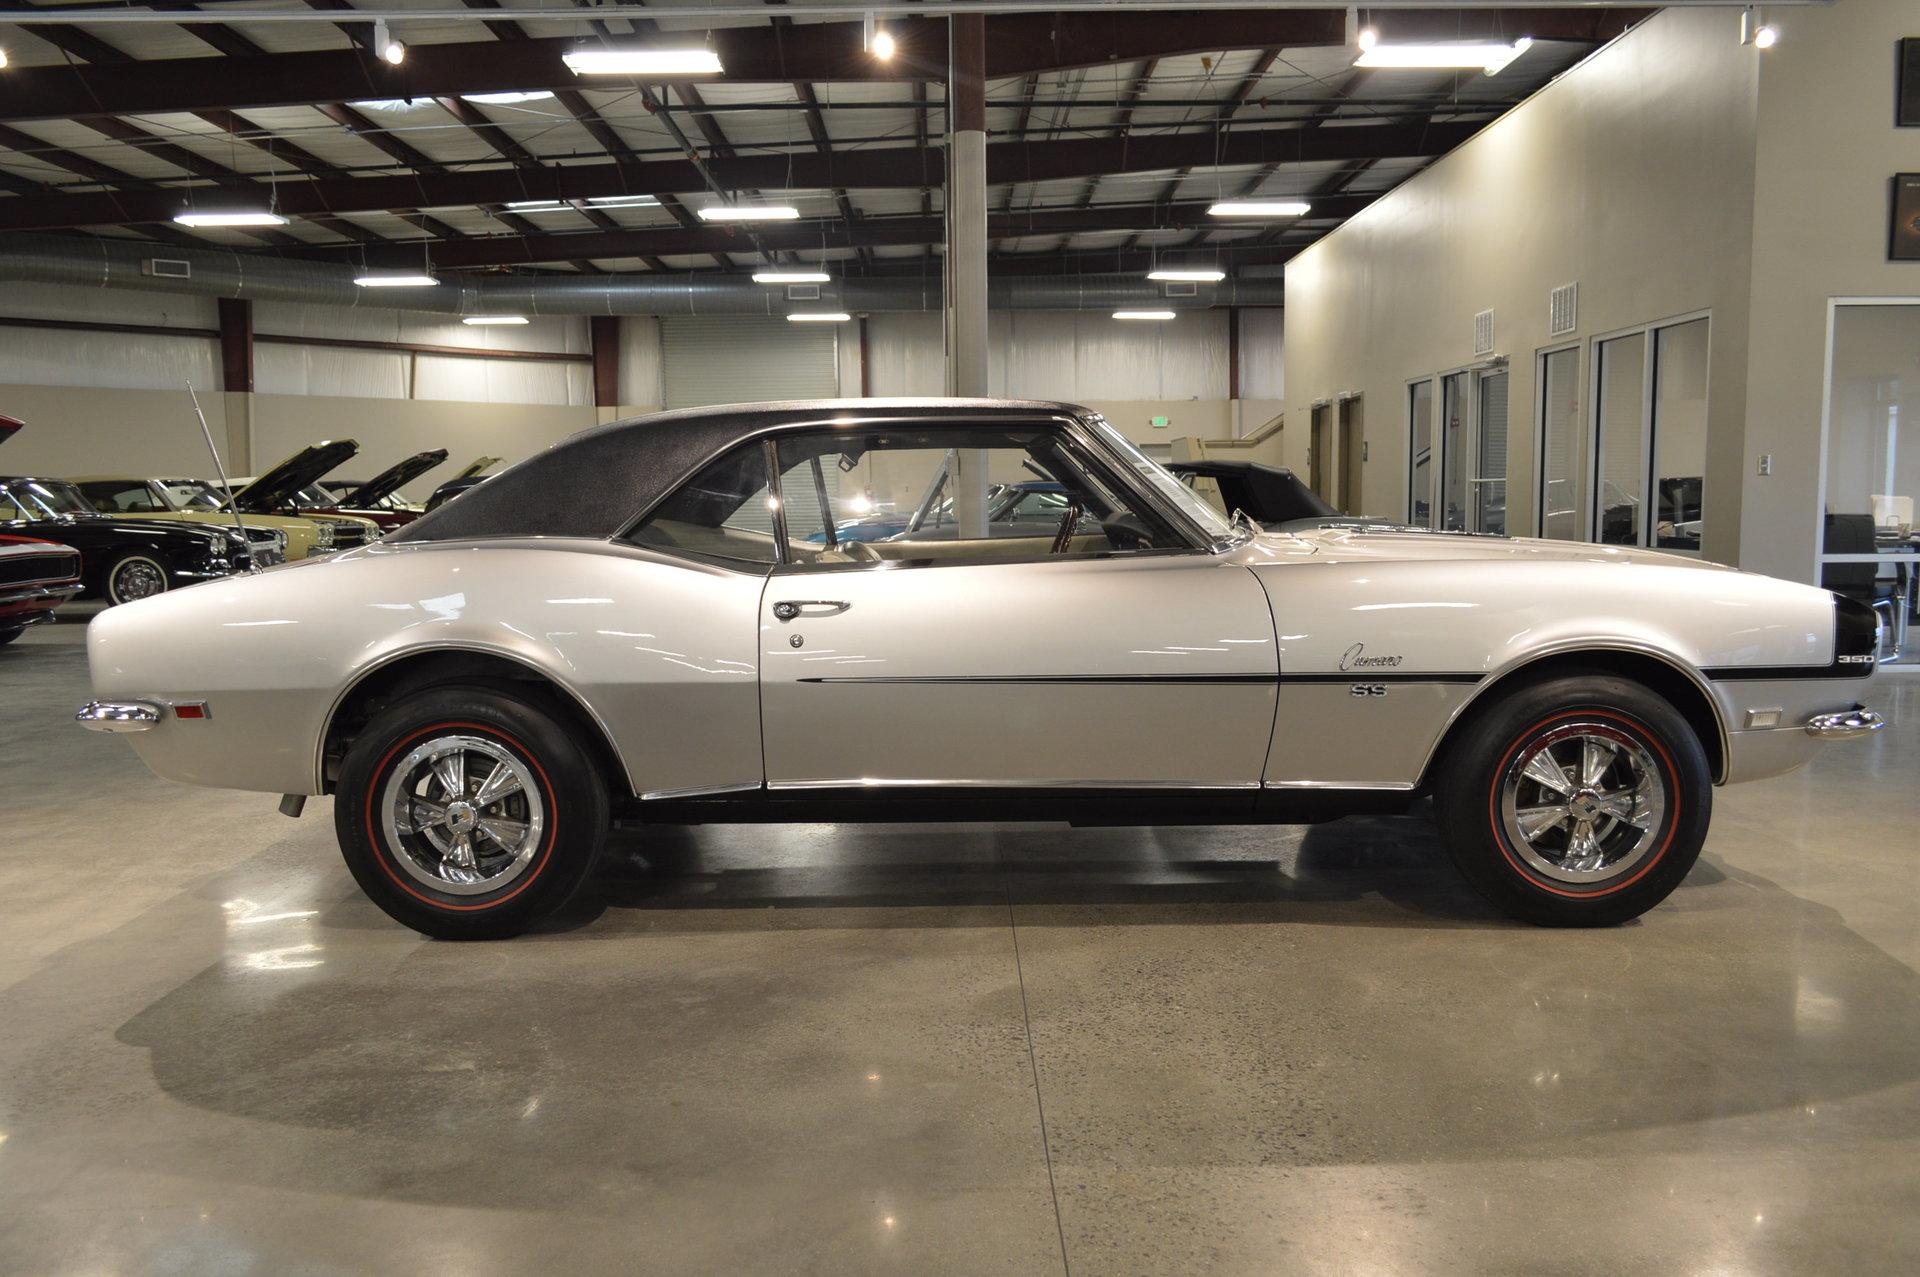 1968 Chevrolet Camaro Leaded Gas Classics Rs Black 15641a917cda Thumb Dana